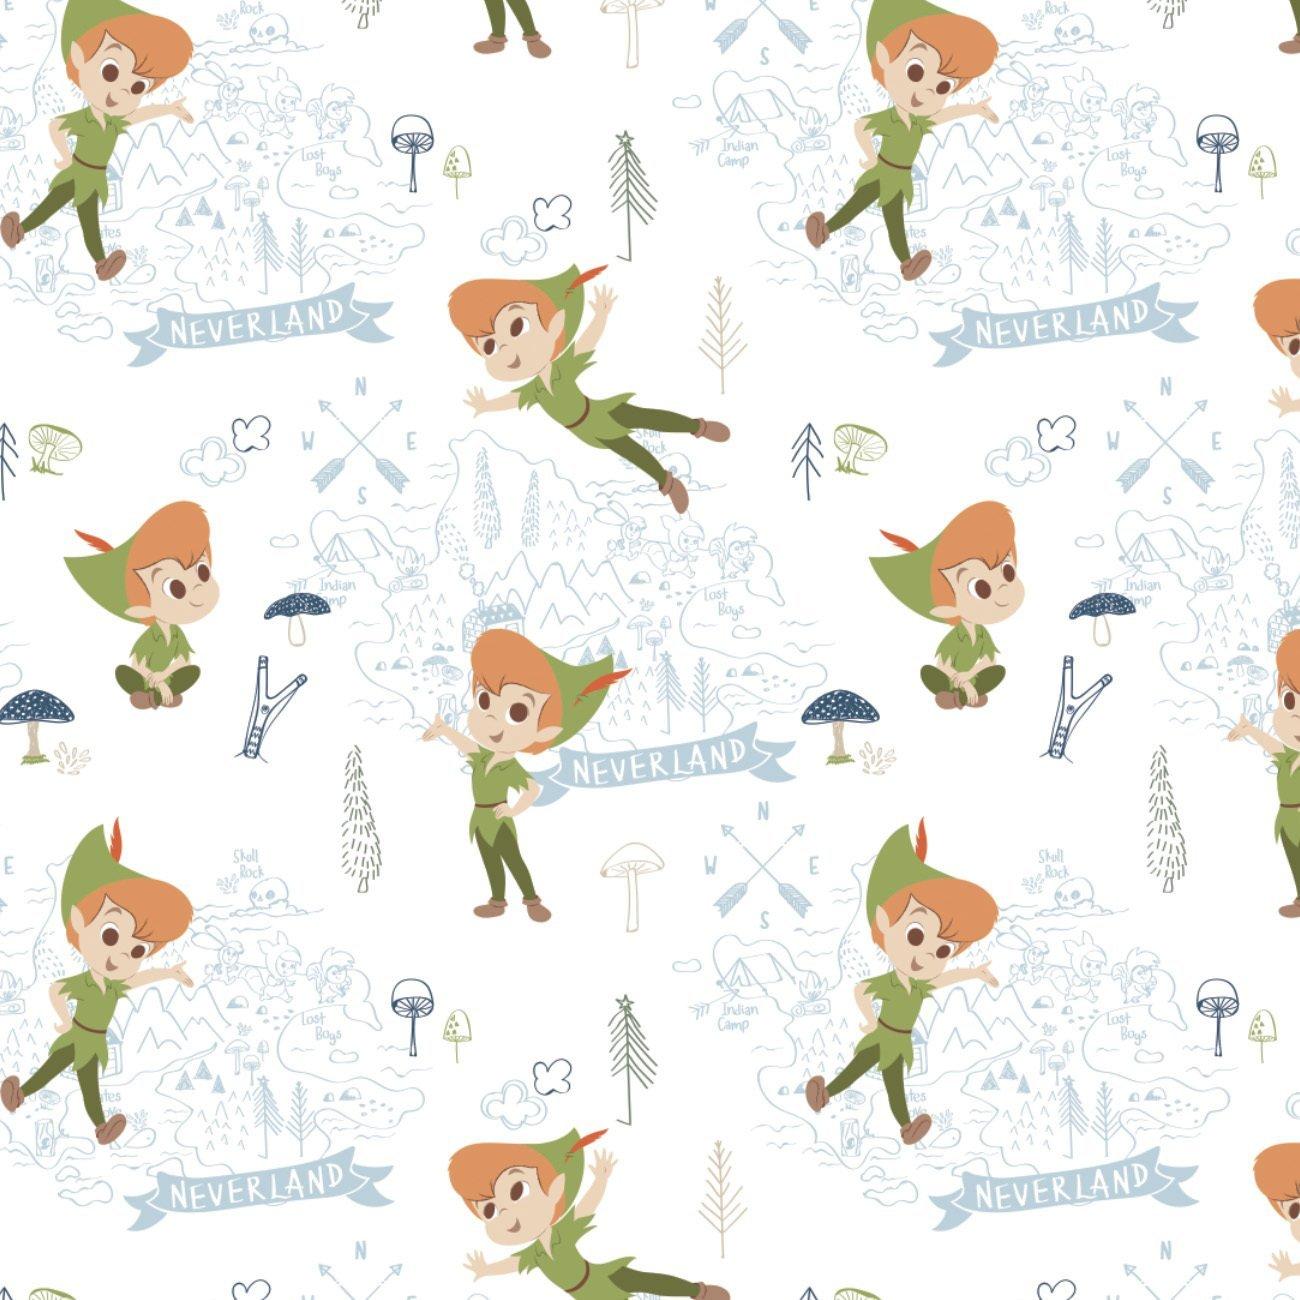 Peter Pan & Tinkerbell - Neverland Adventures (White)